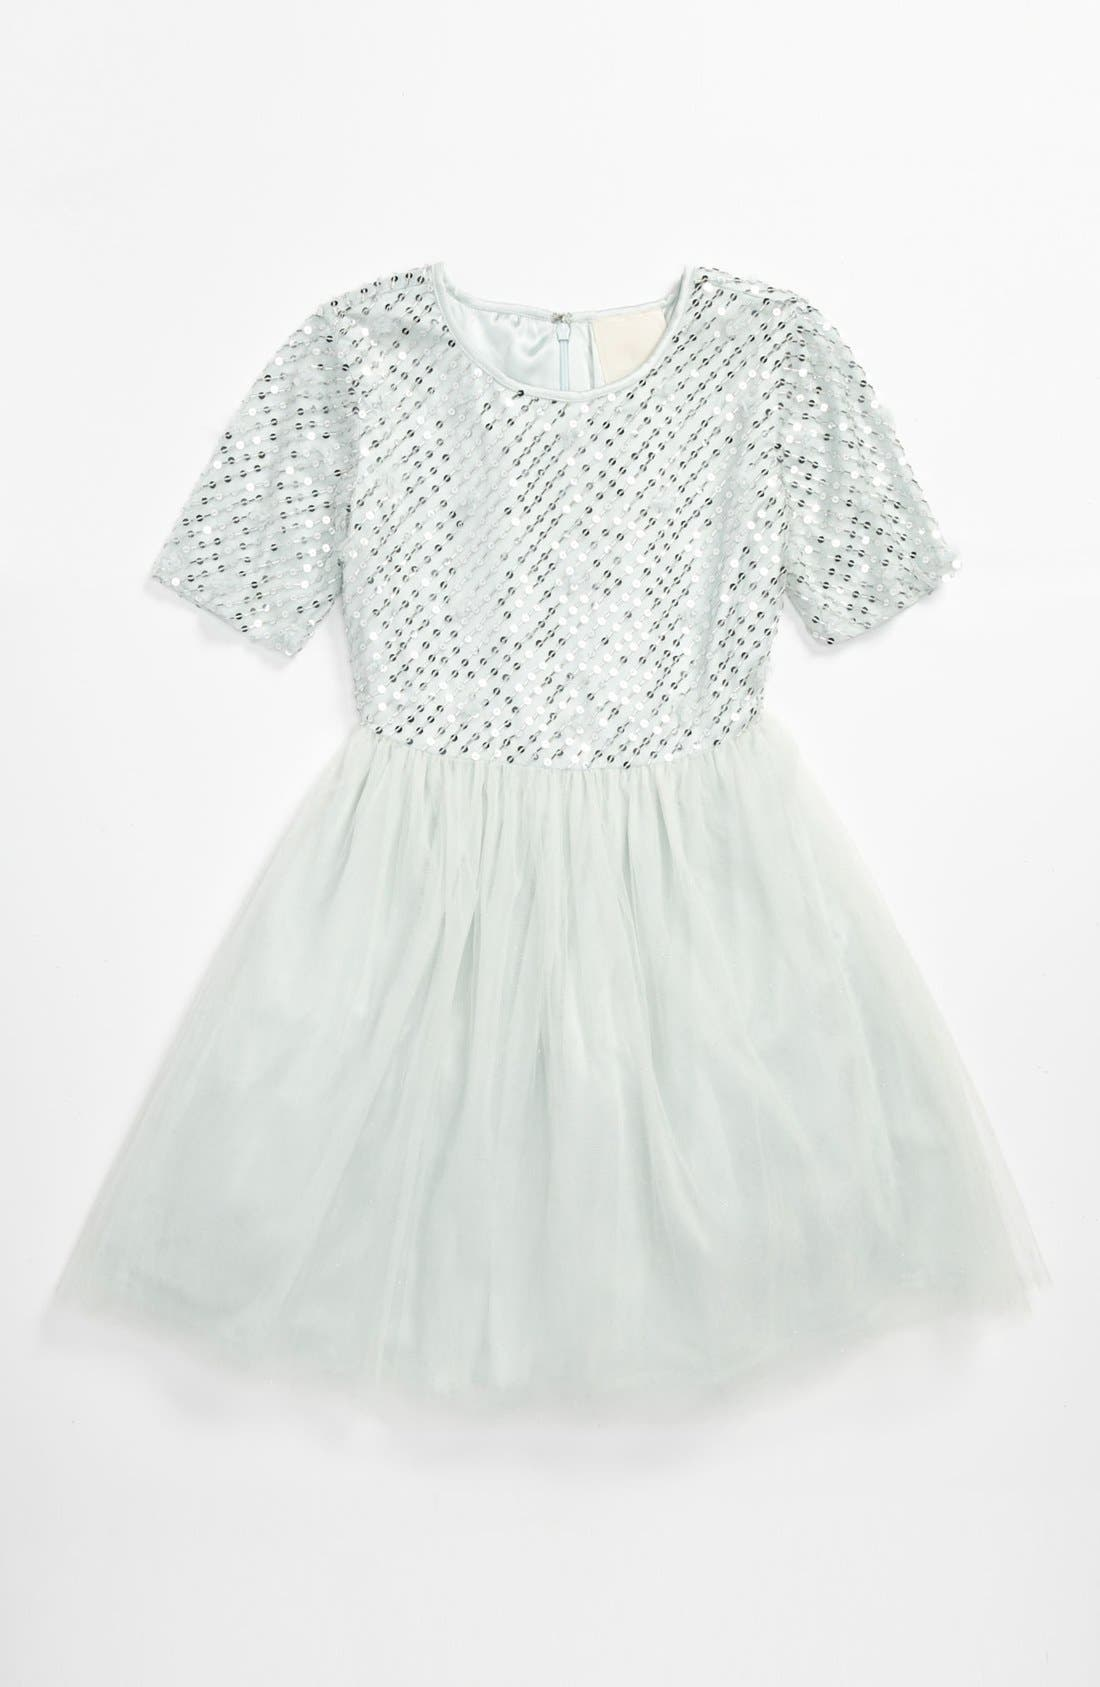 Alternate Image 1 Selected - La Piccola Danza Kidswear Elbow Sleeve Beaded Dress (Big Girls)